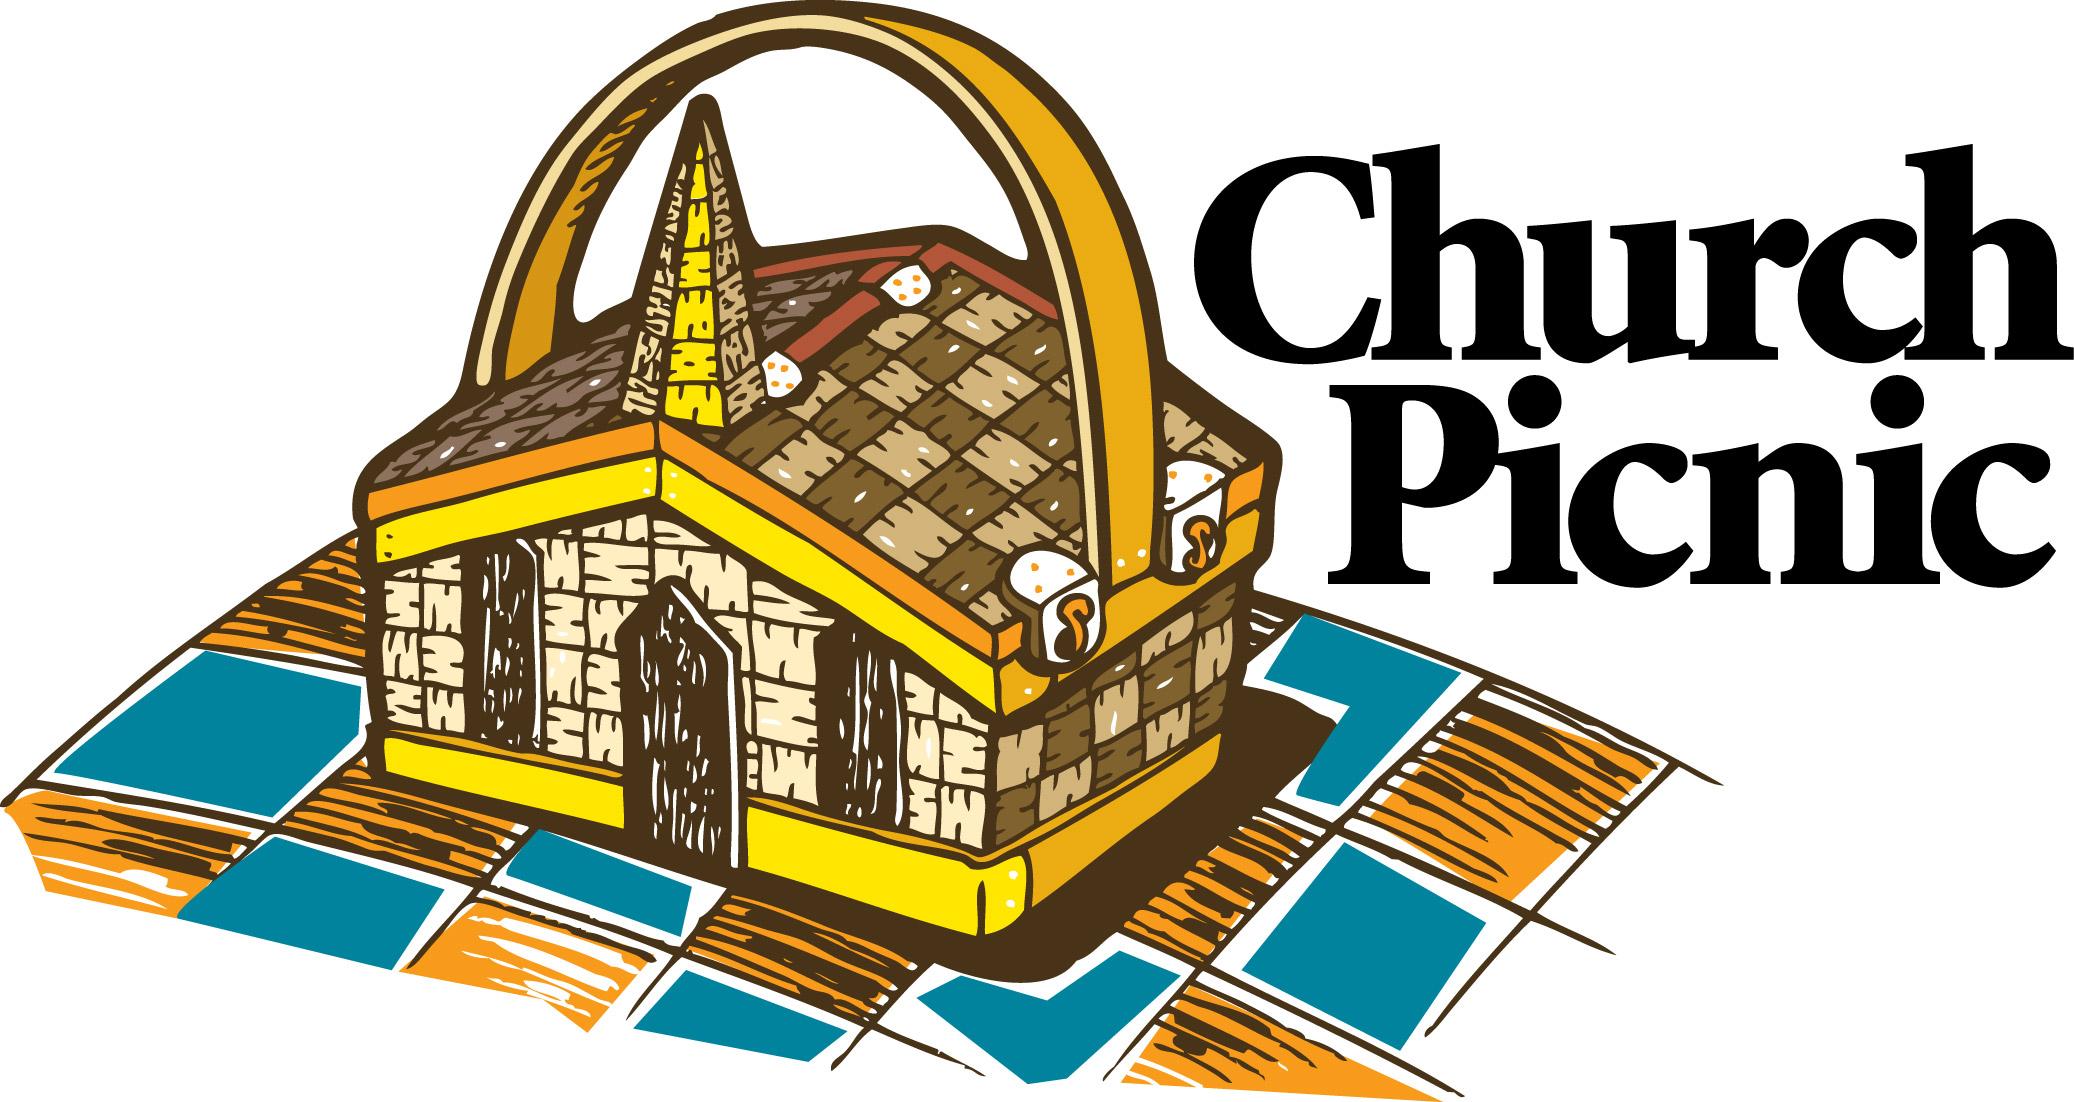 39 Church Picnic free clipart.